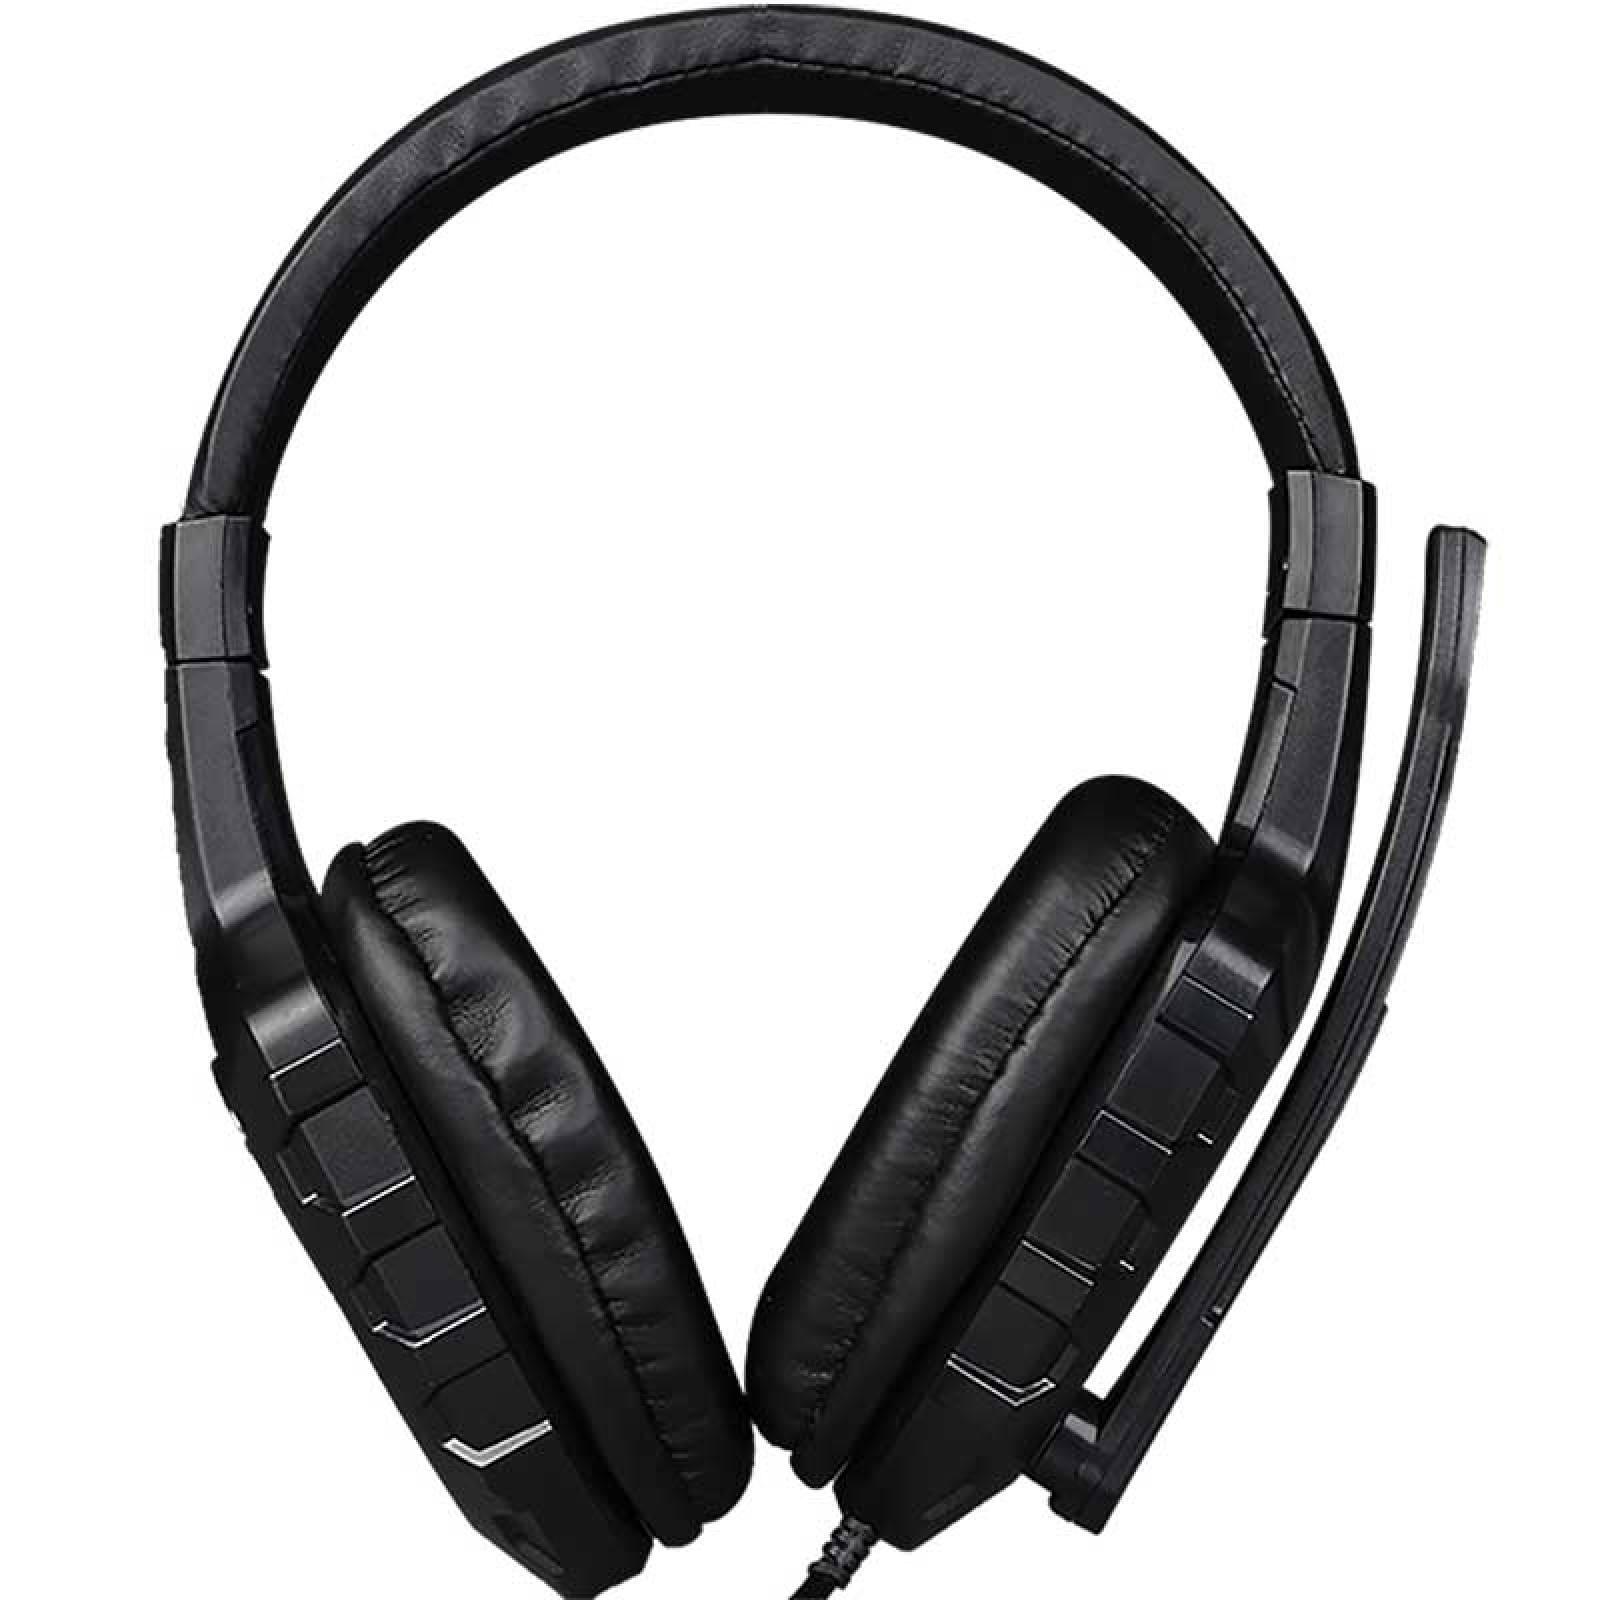 Audifonos Gamer HP-302 Diadema Gaming Pc Doble Jack estandar Xtrikeme 105 dB 20 Hz